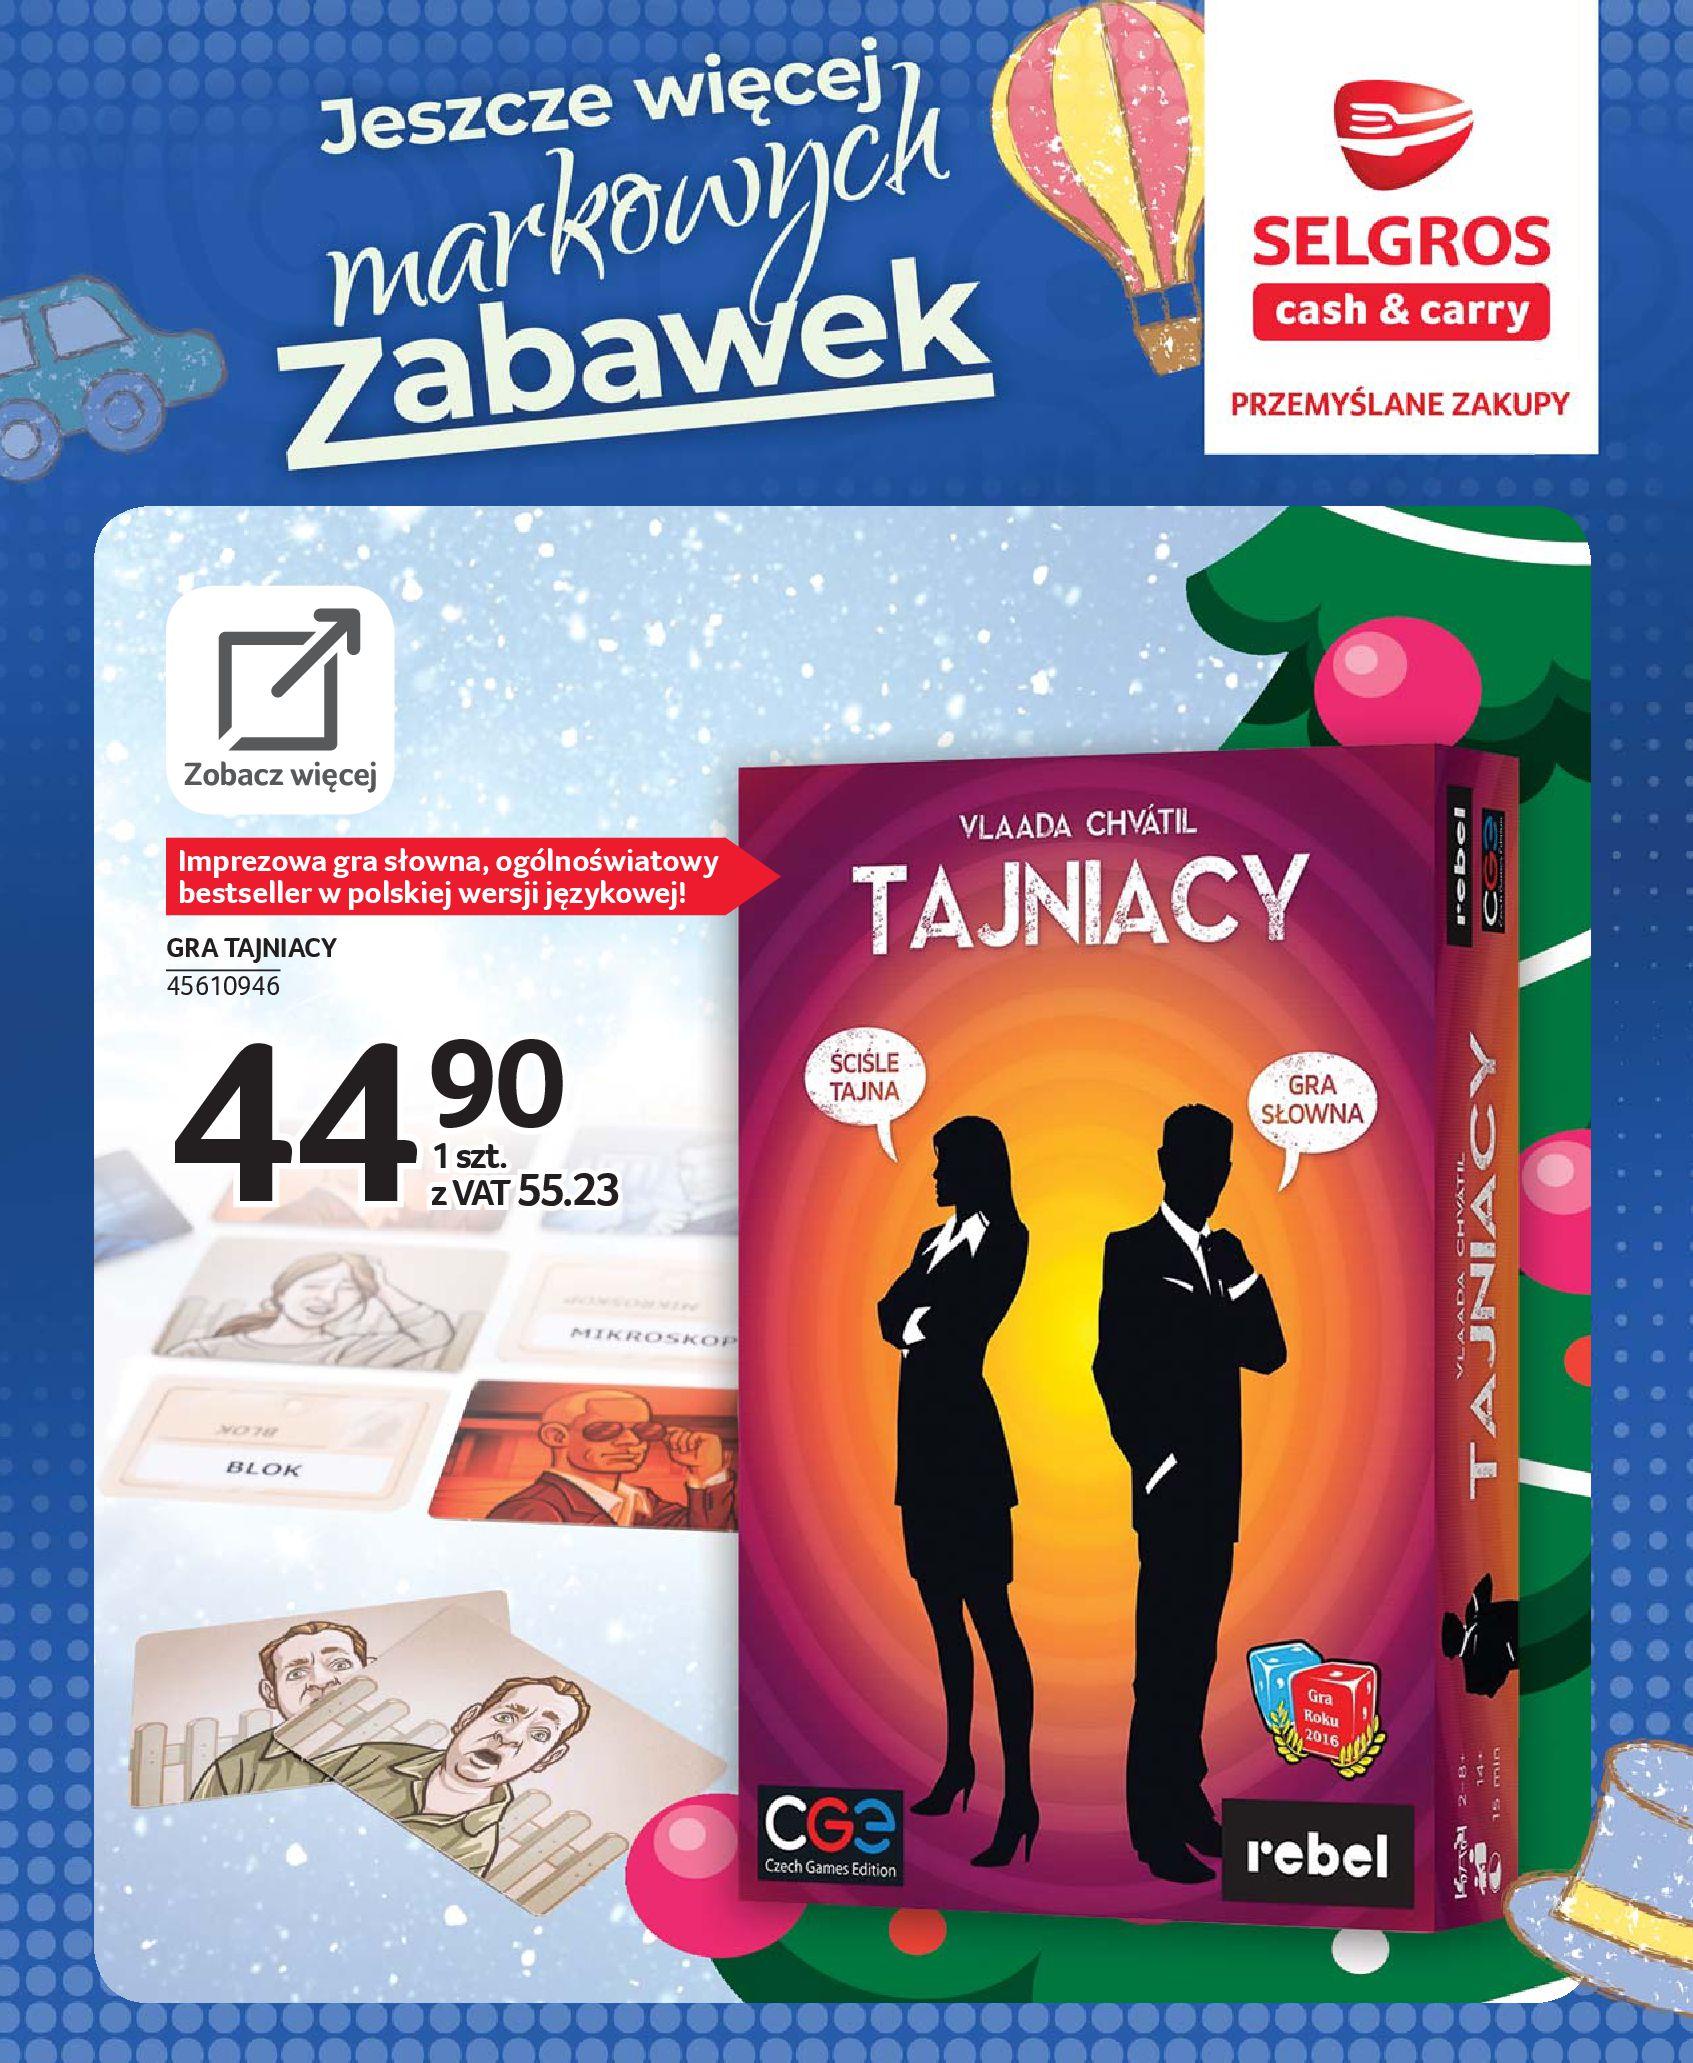 Gazetka Selgros - Katalog zabawek-20.11.2019-24.12.2019-page-85